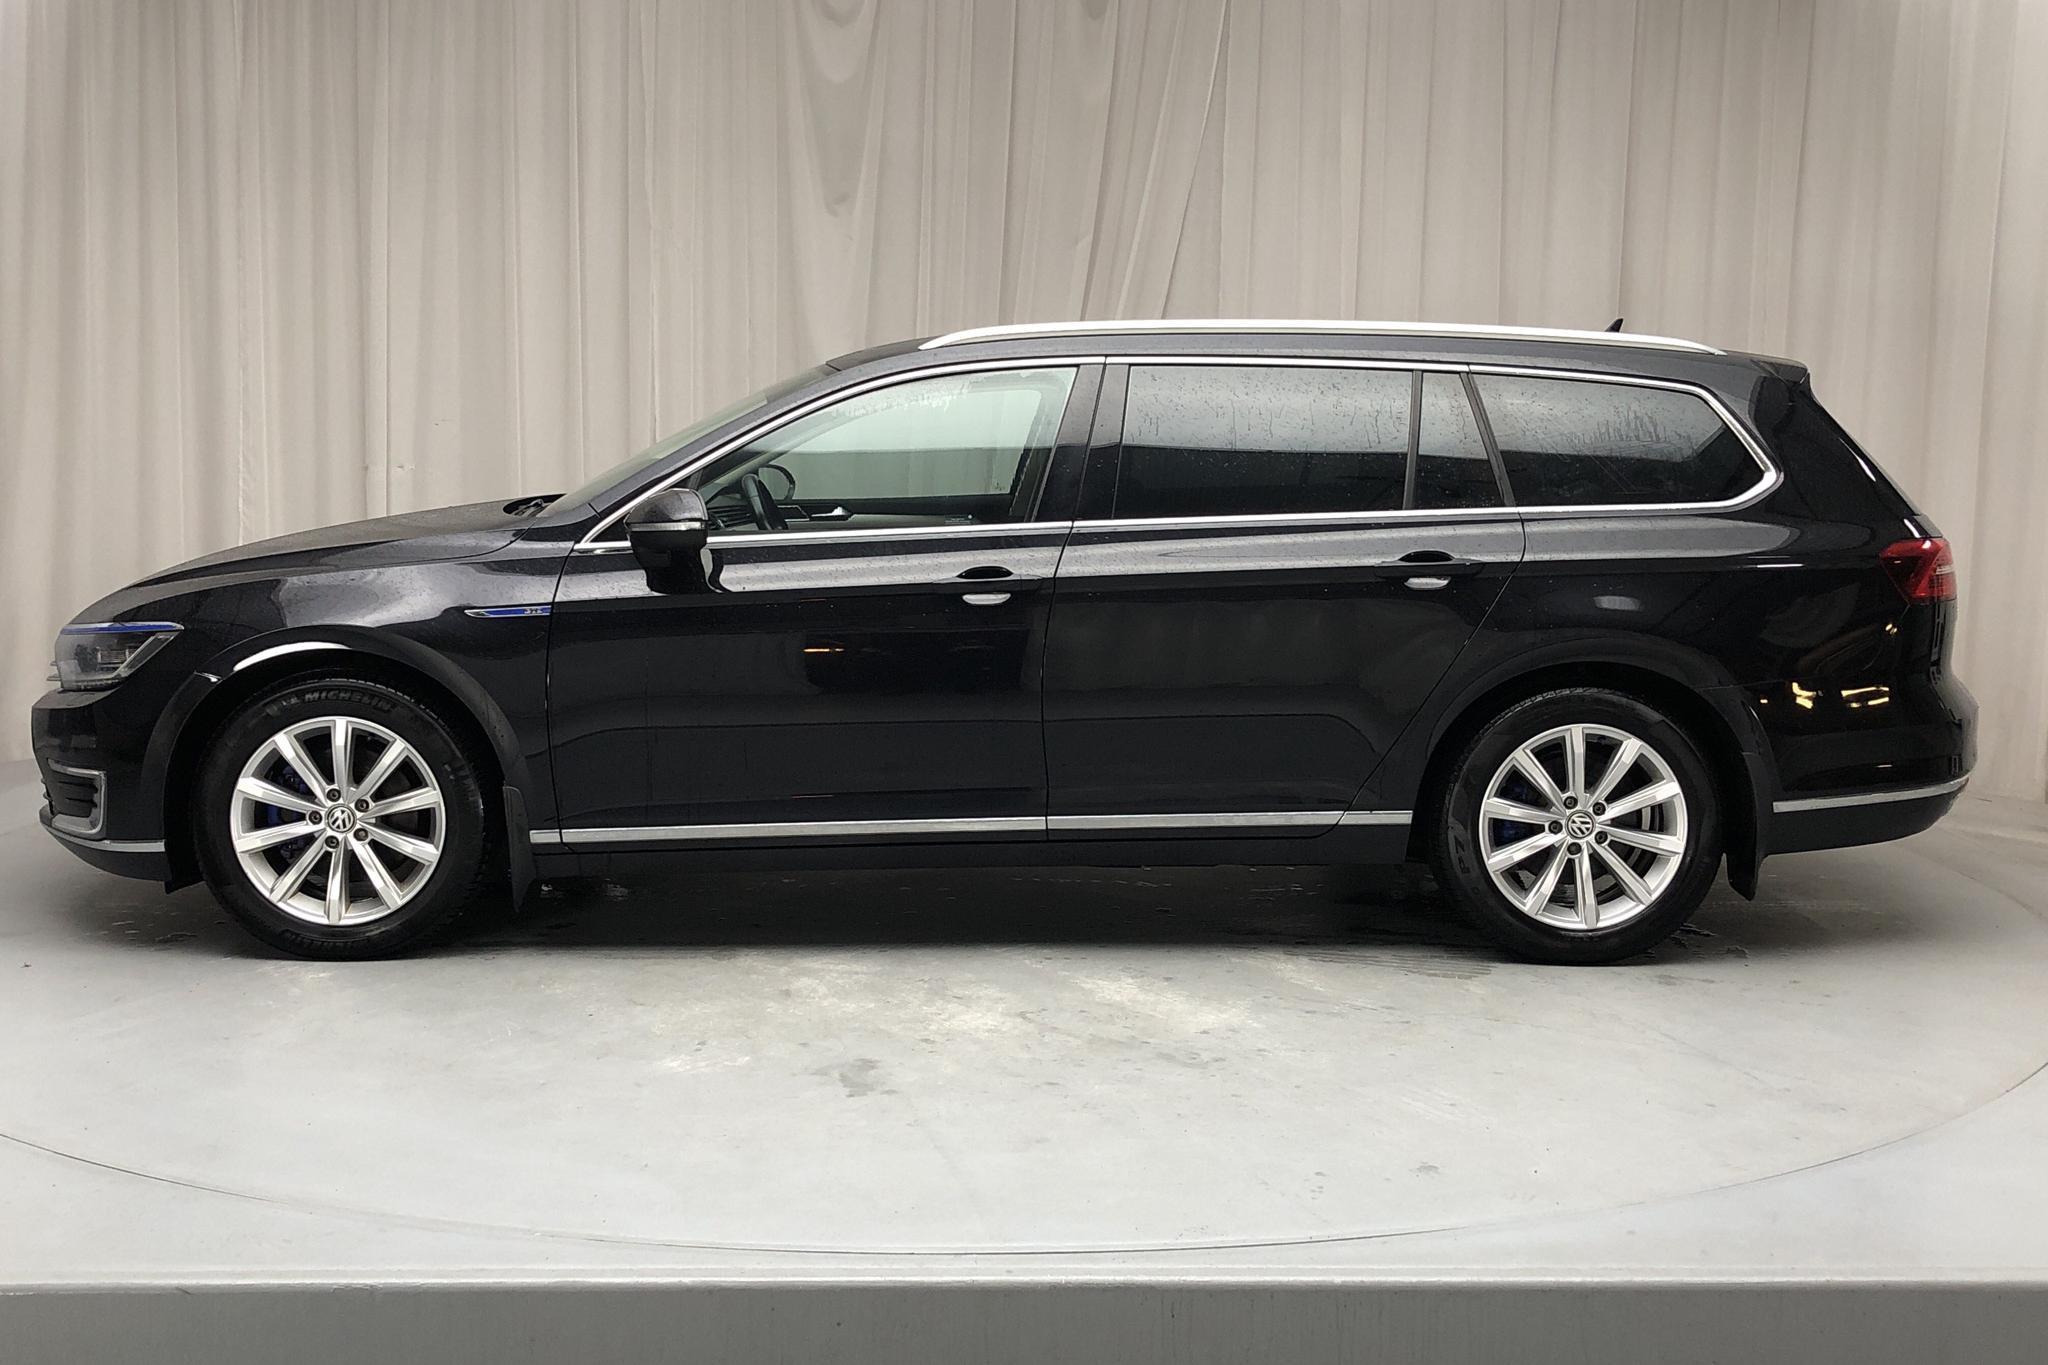 VW Passat 1.4 Plug-in-Hybrid Sportscombi (218hk) - 141 180 km - Automatic - black - 2017